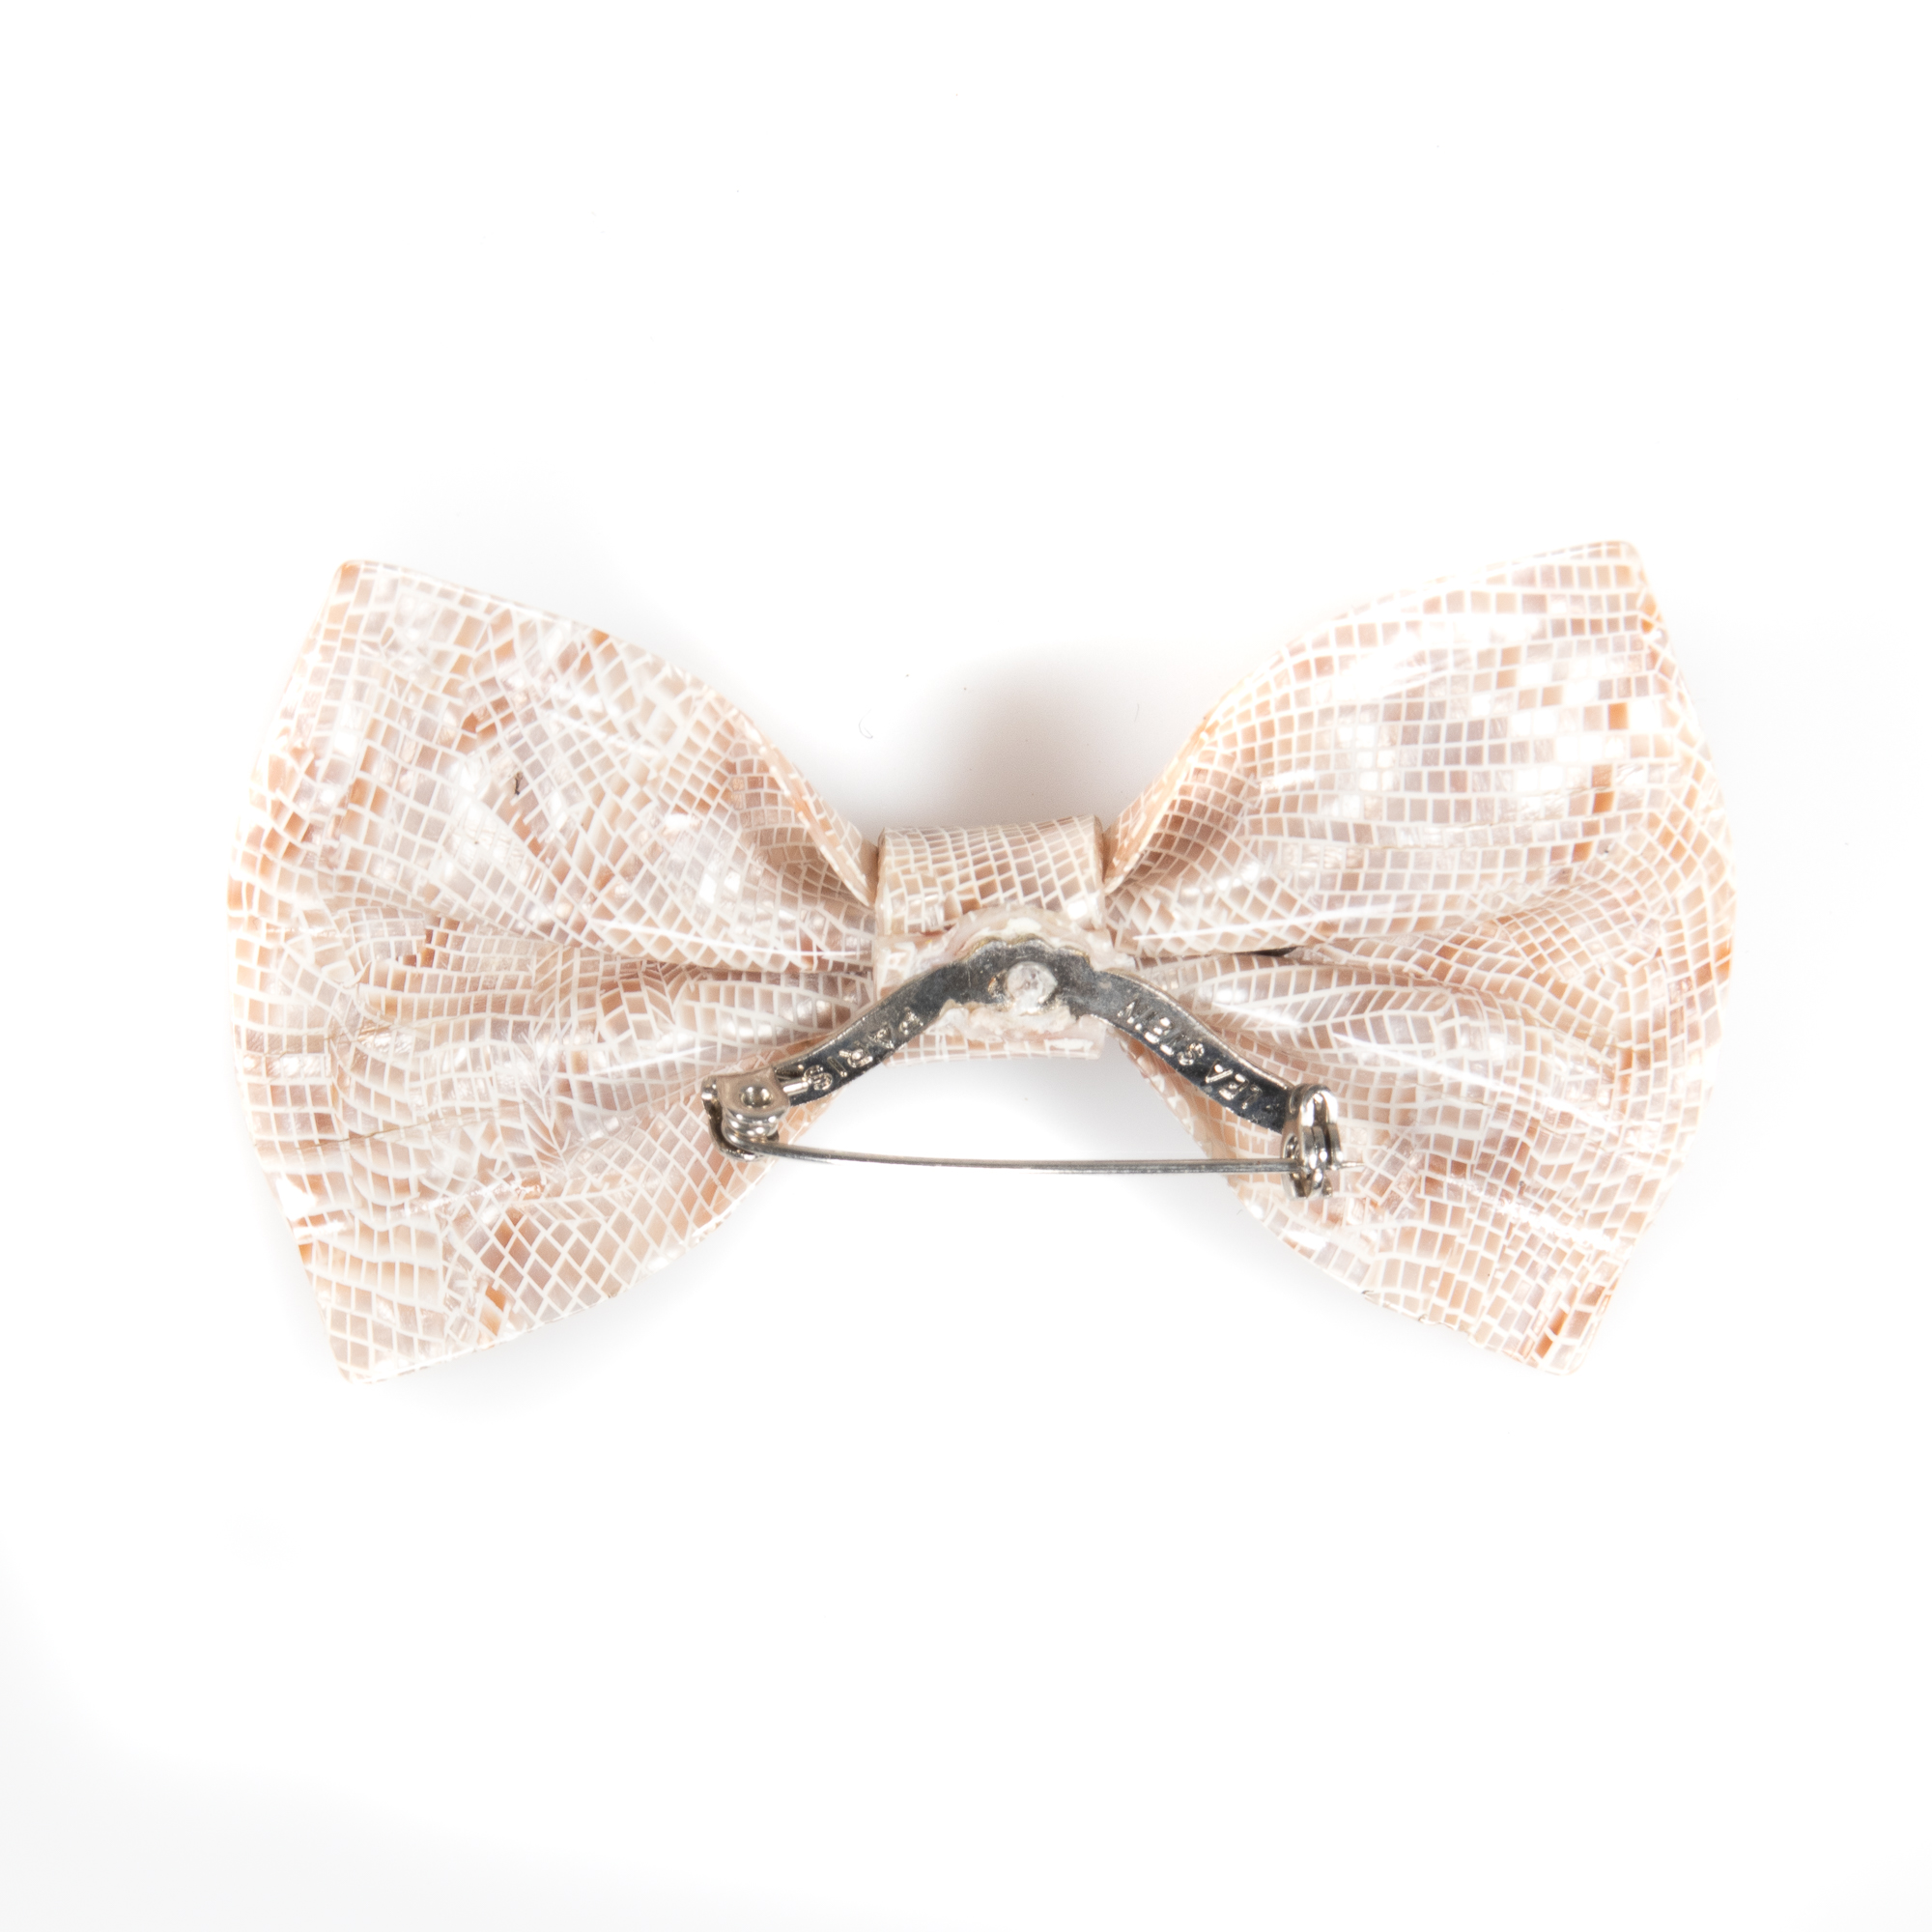 Lea Stein Signed Paris Bakelite Designer Brooch - Image 4 of 6